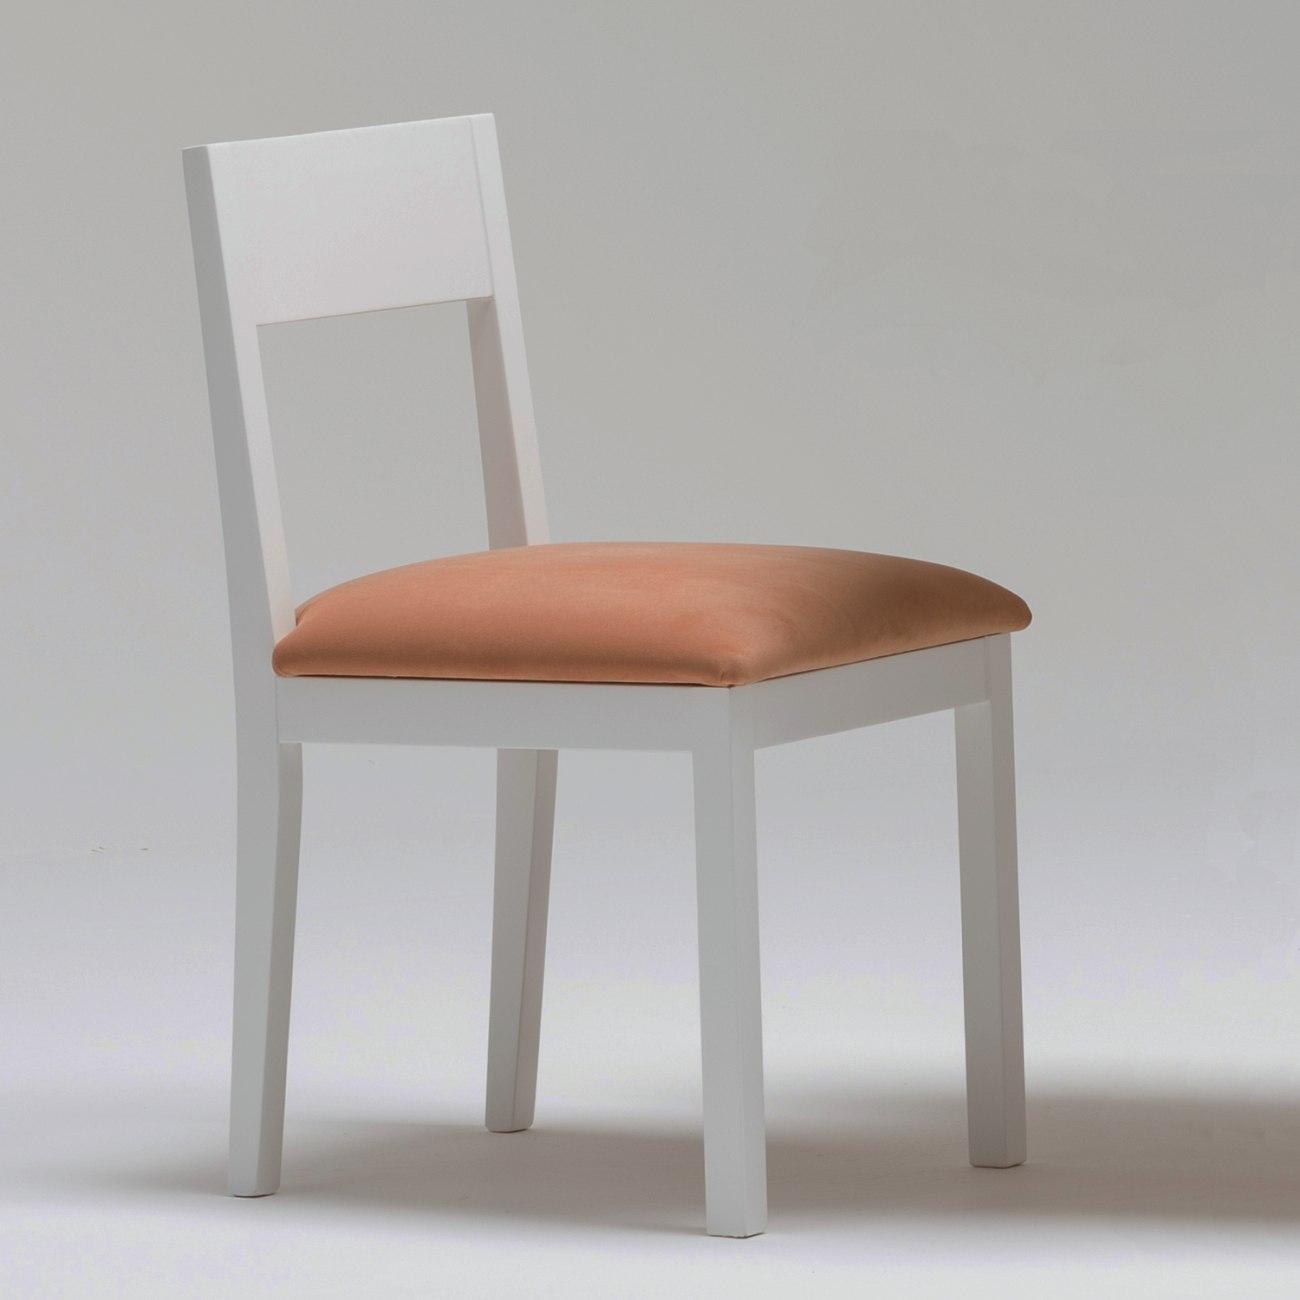 sandalye_dunyasi_mobilyacini_sn_mobilya_fold_beyaz_sandalye (2)